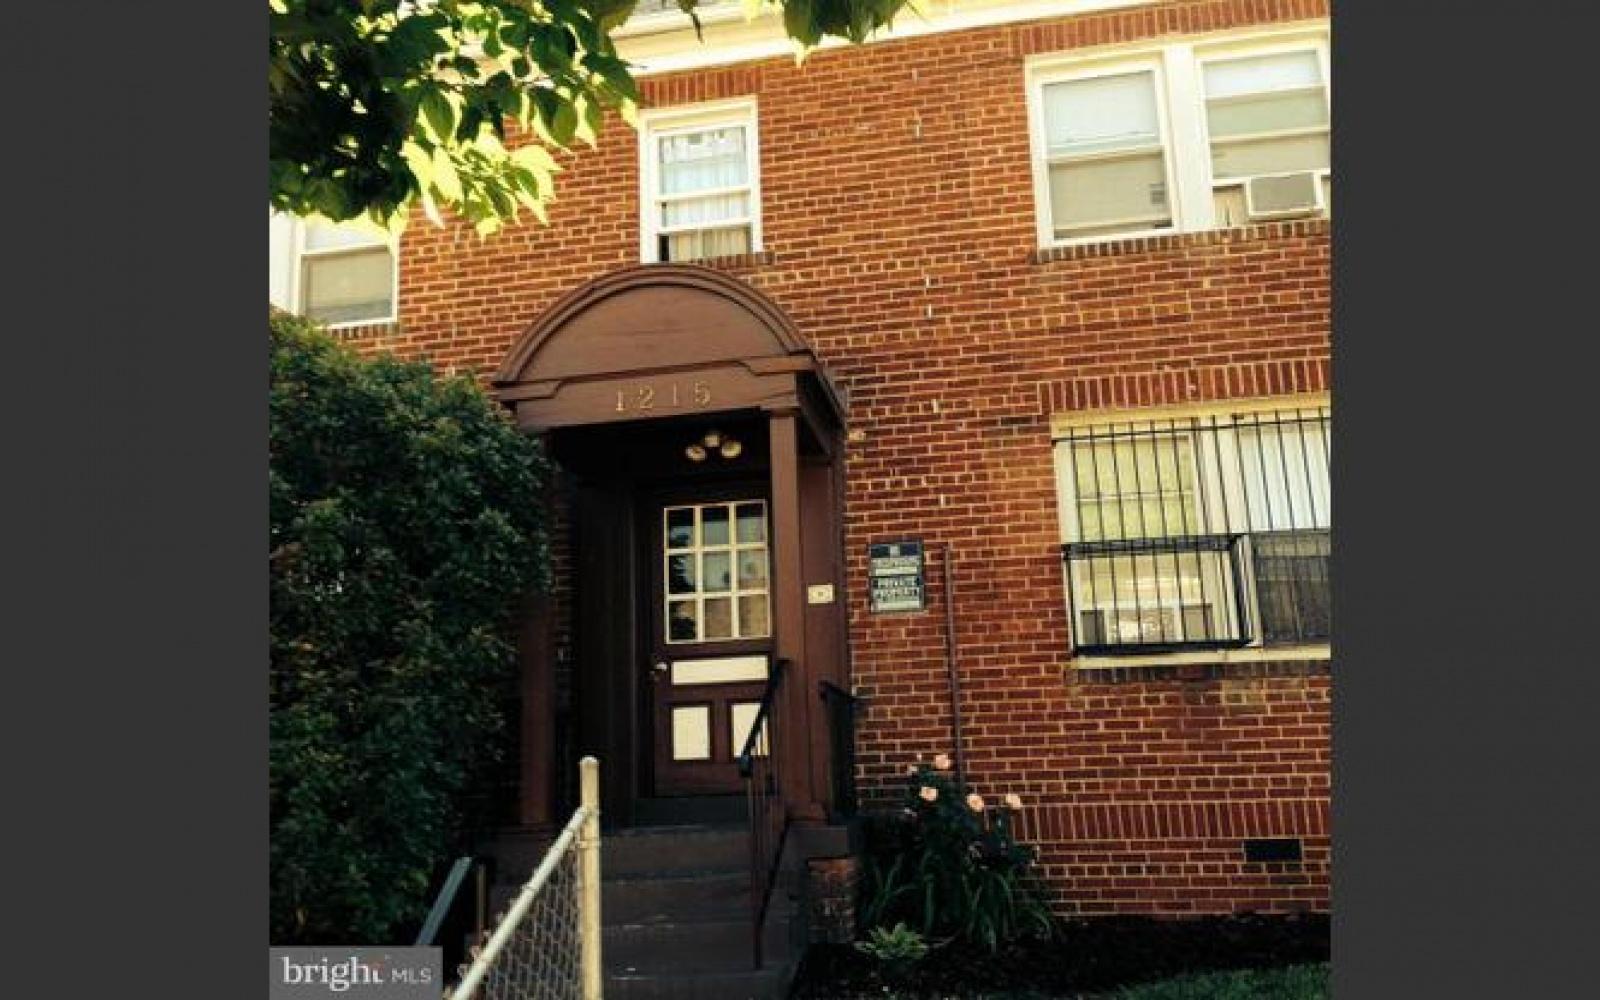 1215 18th Pl NE,Washington,District Of Columbia 20002,2 Bedrooms Bedrooms,1 BathroomBathrooms,Apartment,18th Pl,1098